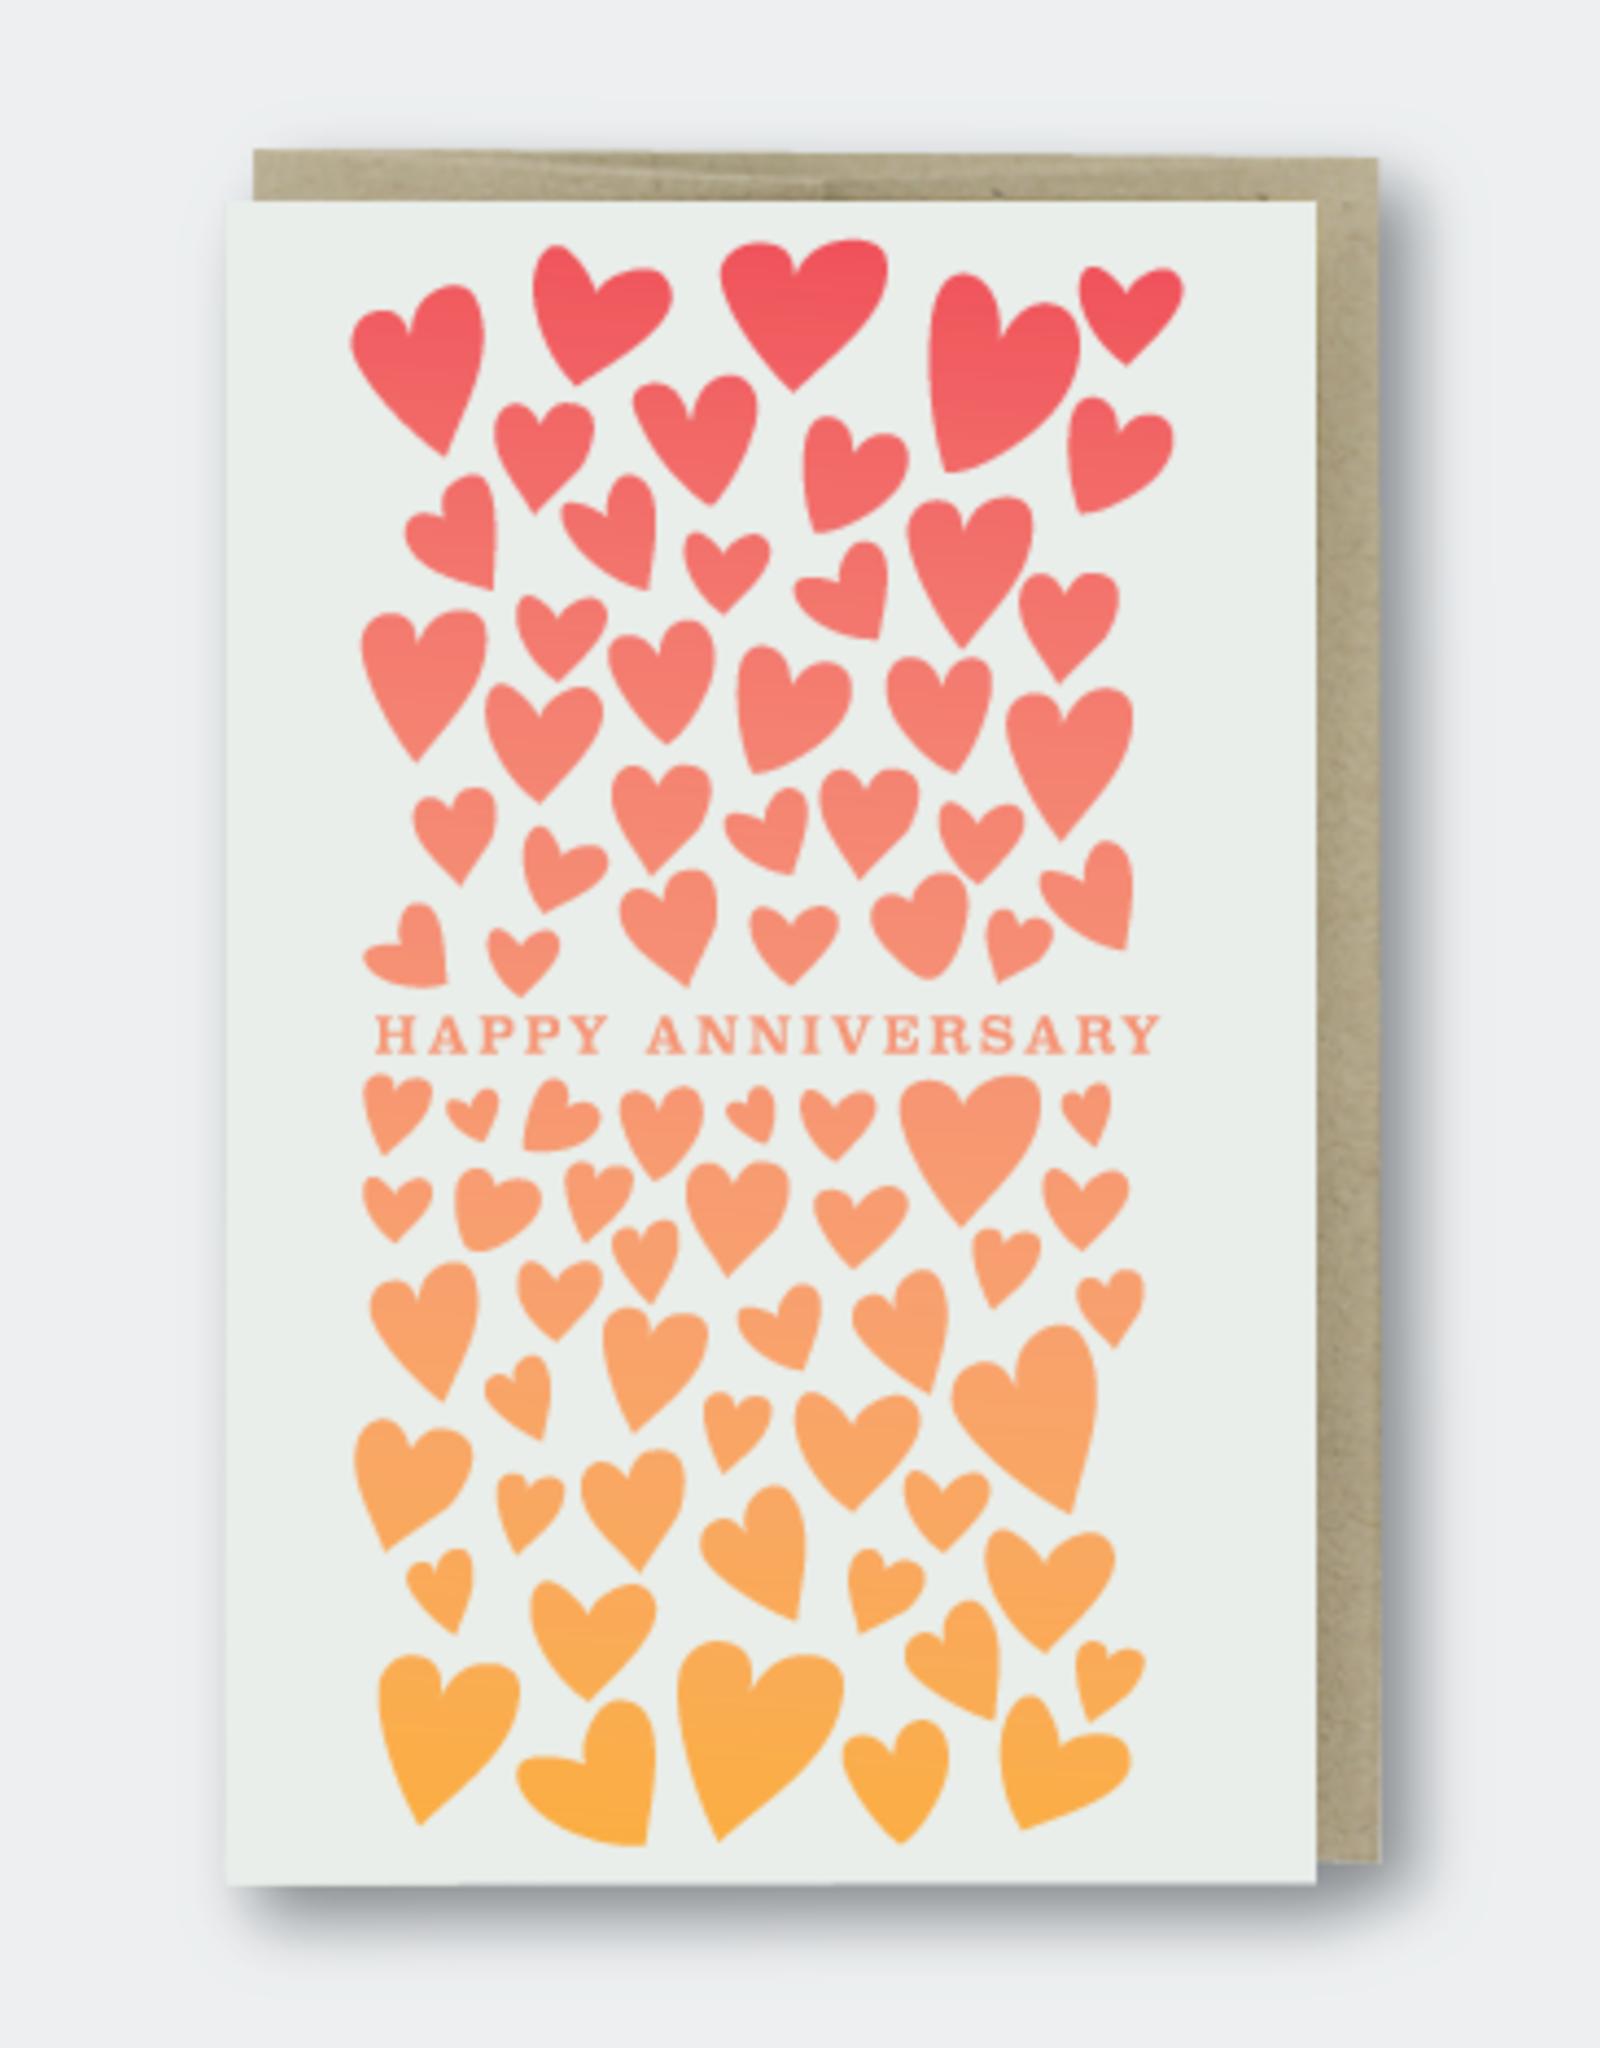 Happy Anniversary (hearts) Greeting Card